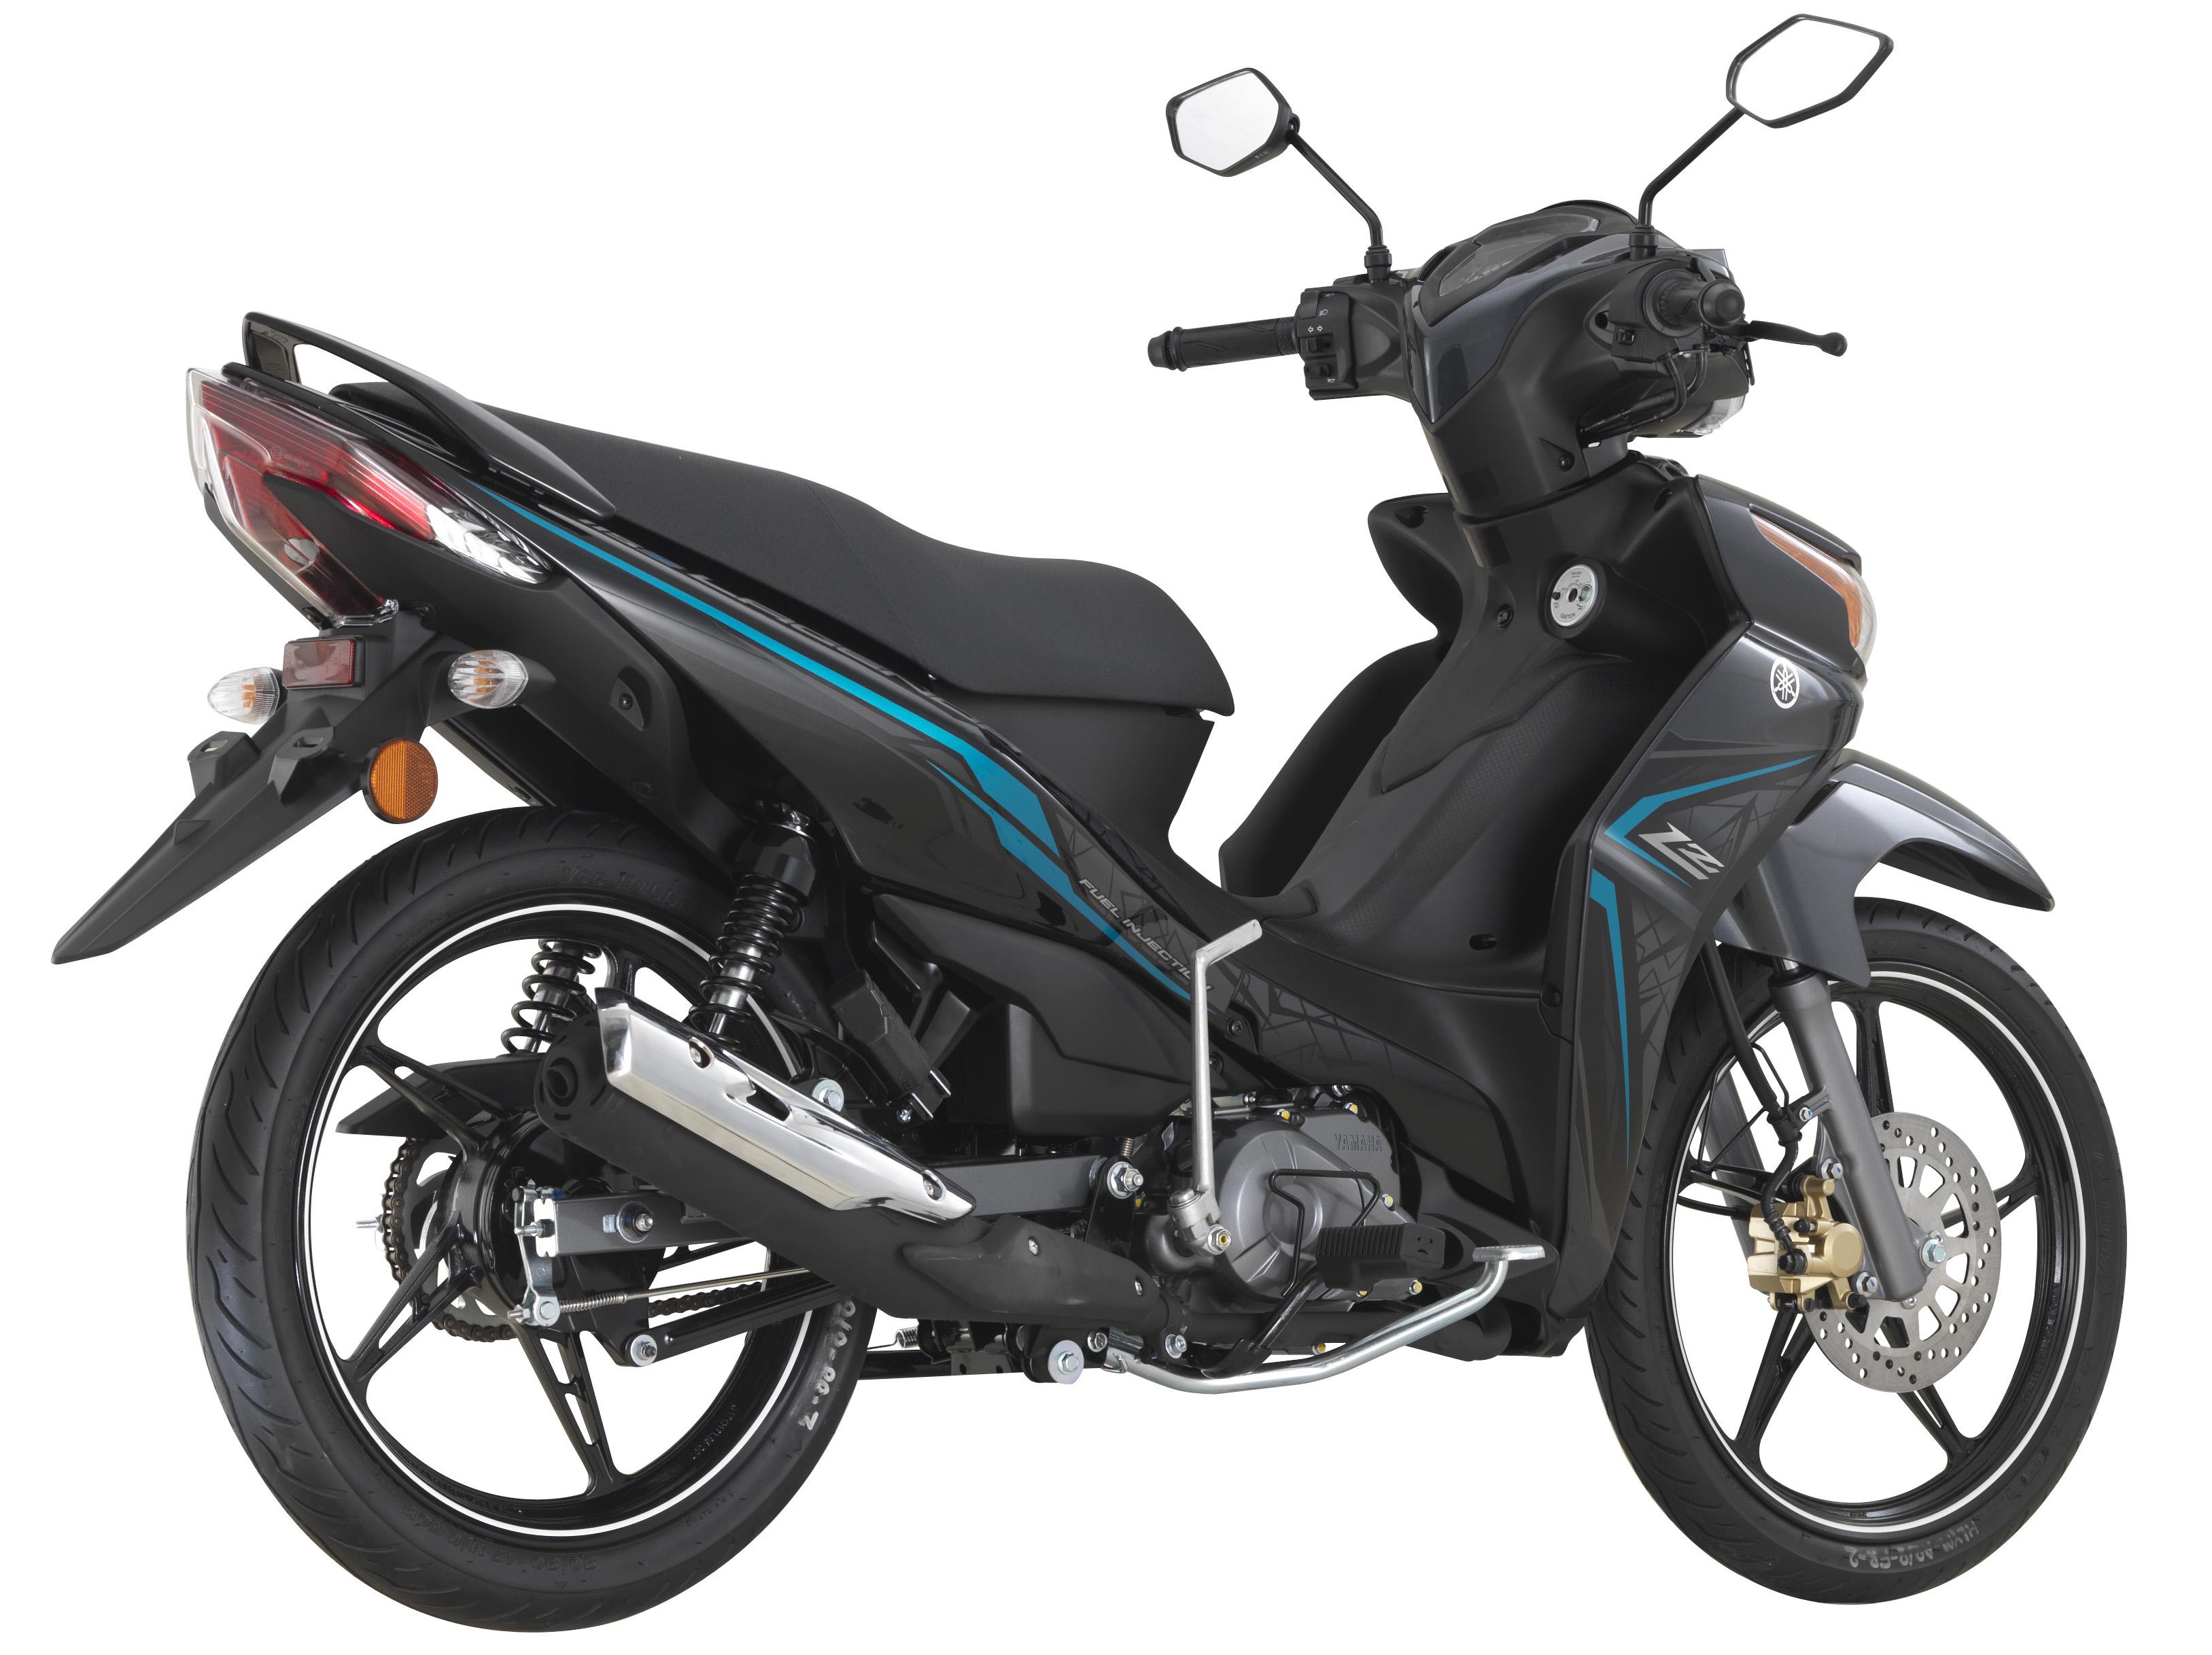 2017 Yamaha Lagenda L115Z In New Colours